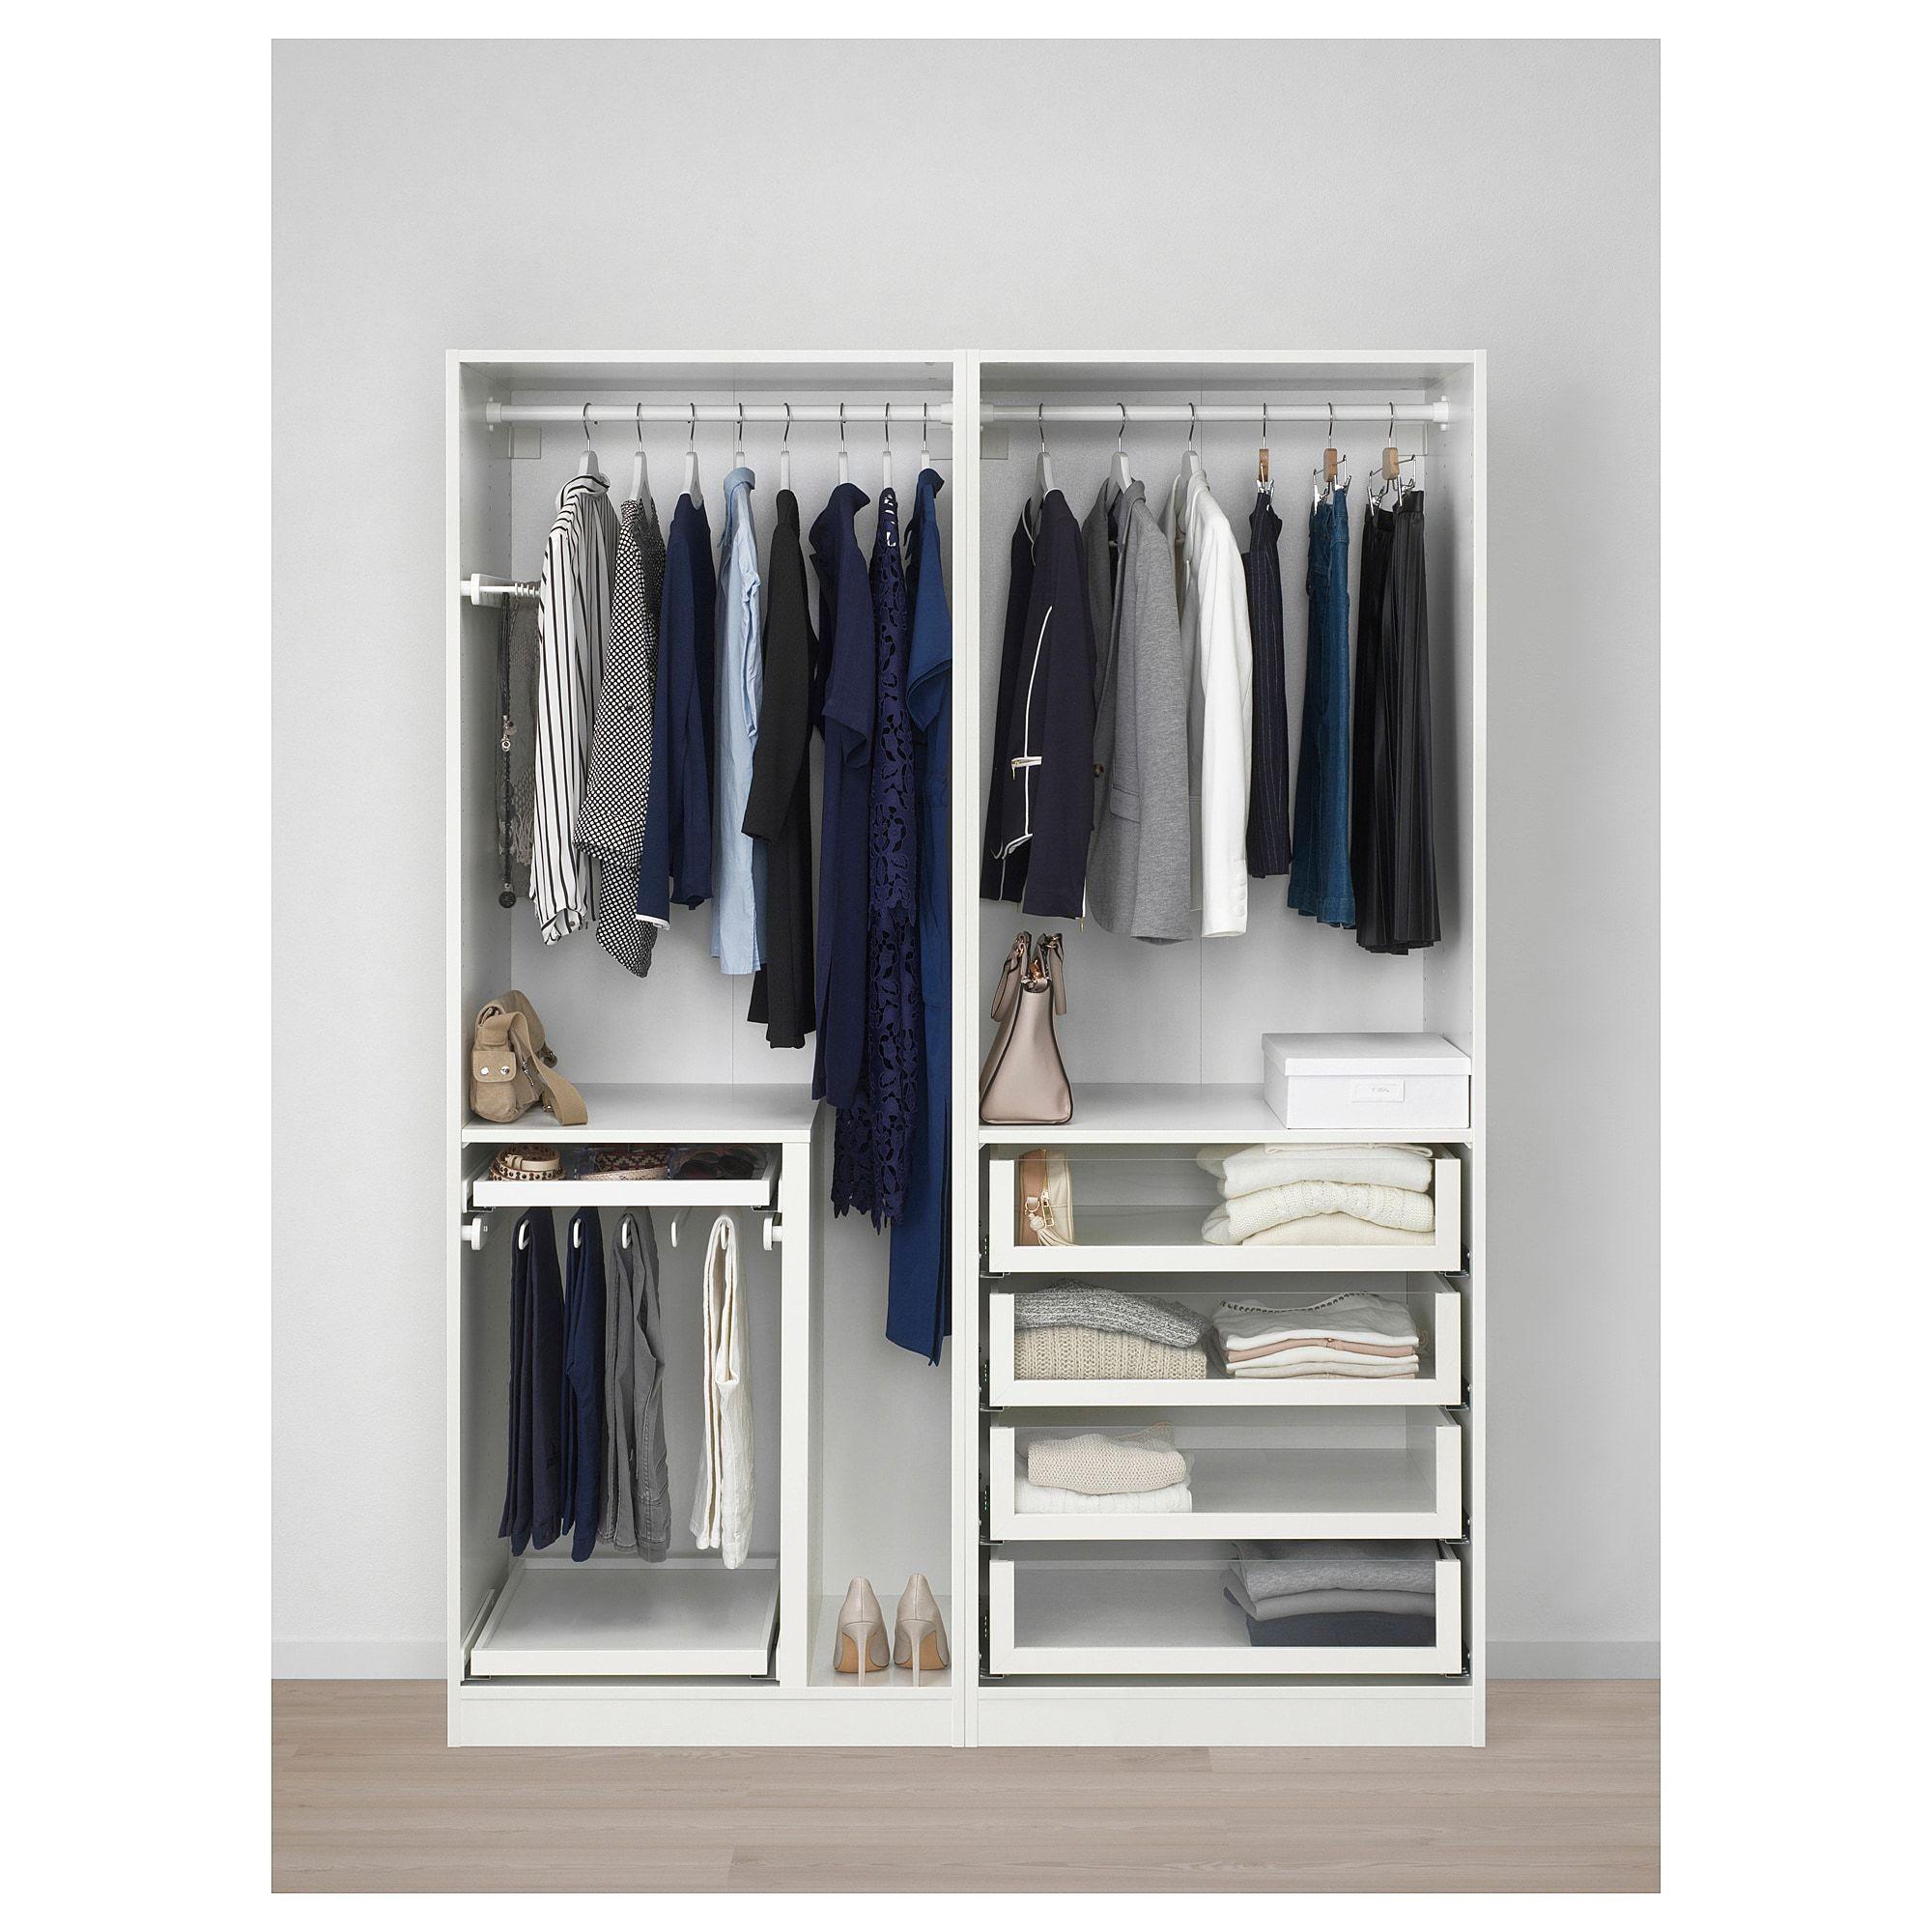 PAX Wardrobe white, Uggdal gray glass IKEA, glass